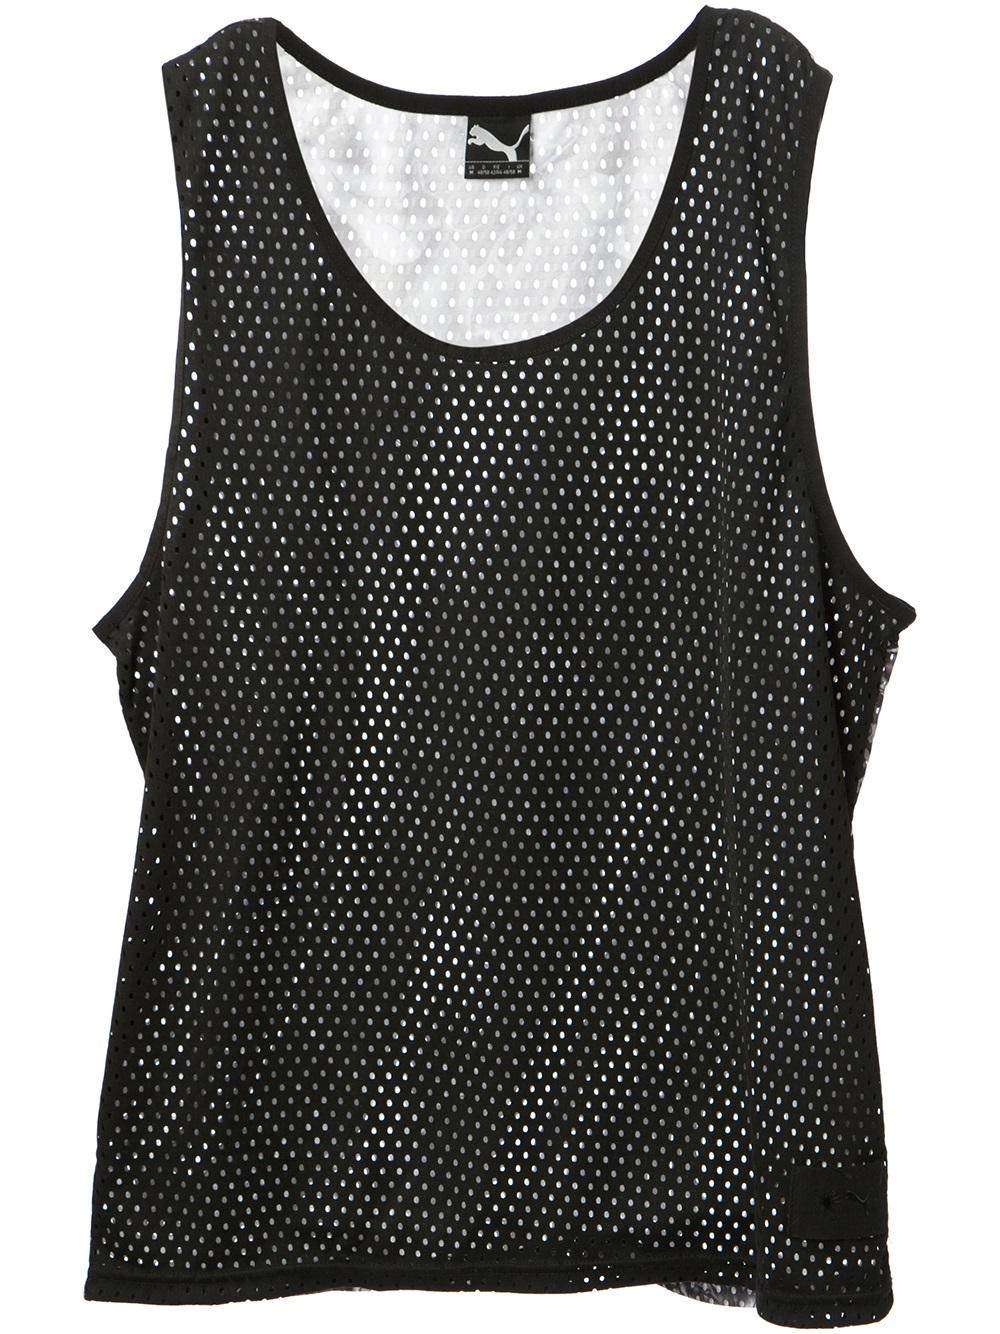 55a2d51007aec Lyst - PUMA Mesh Tank Top in Black for Men